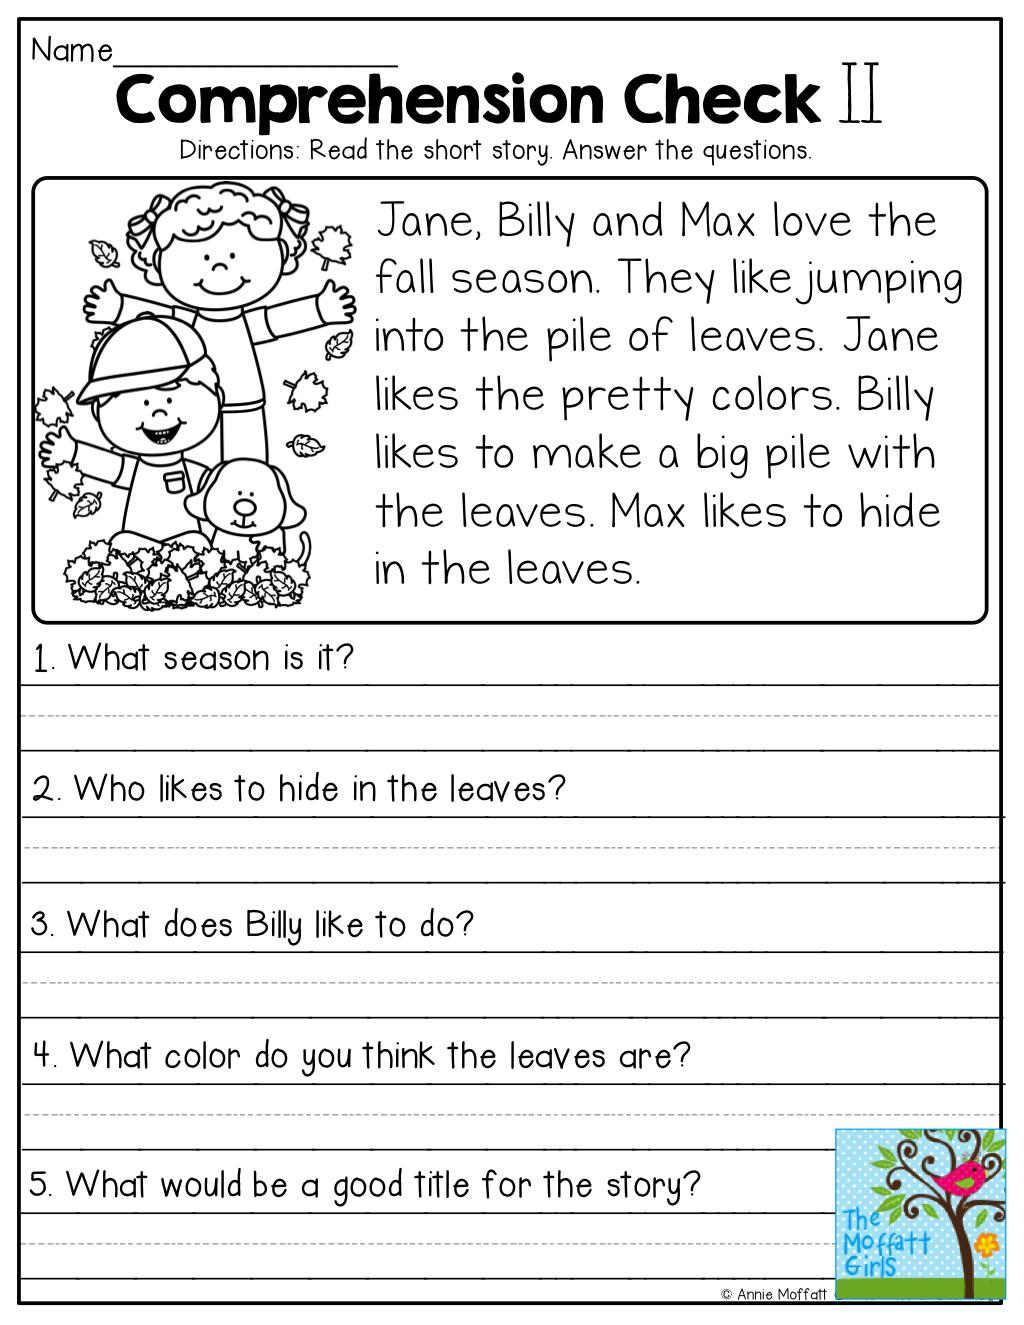 Free Grade 4 Reading Comprehension Worksheets Worksheets For All